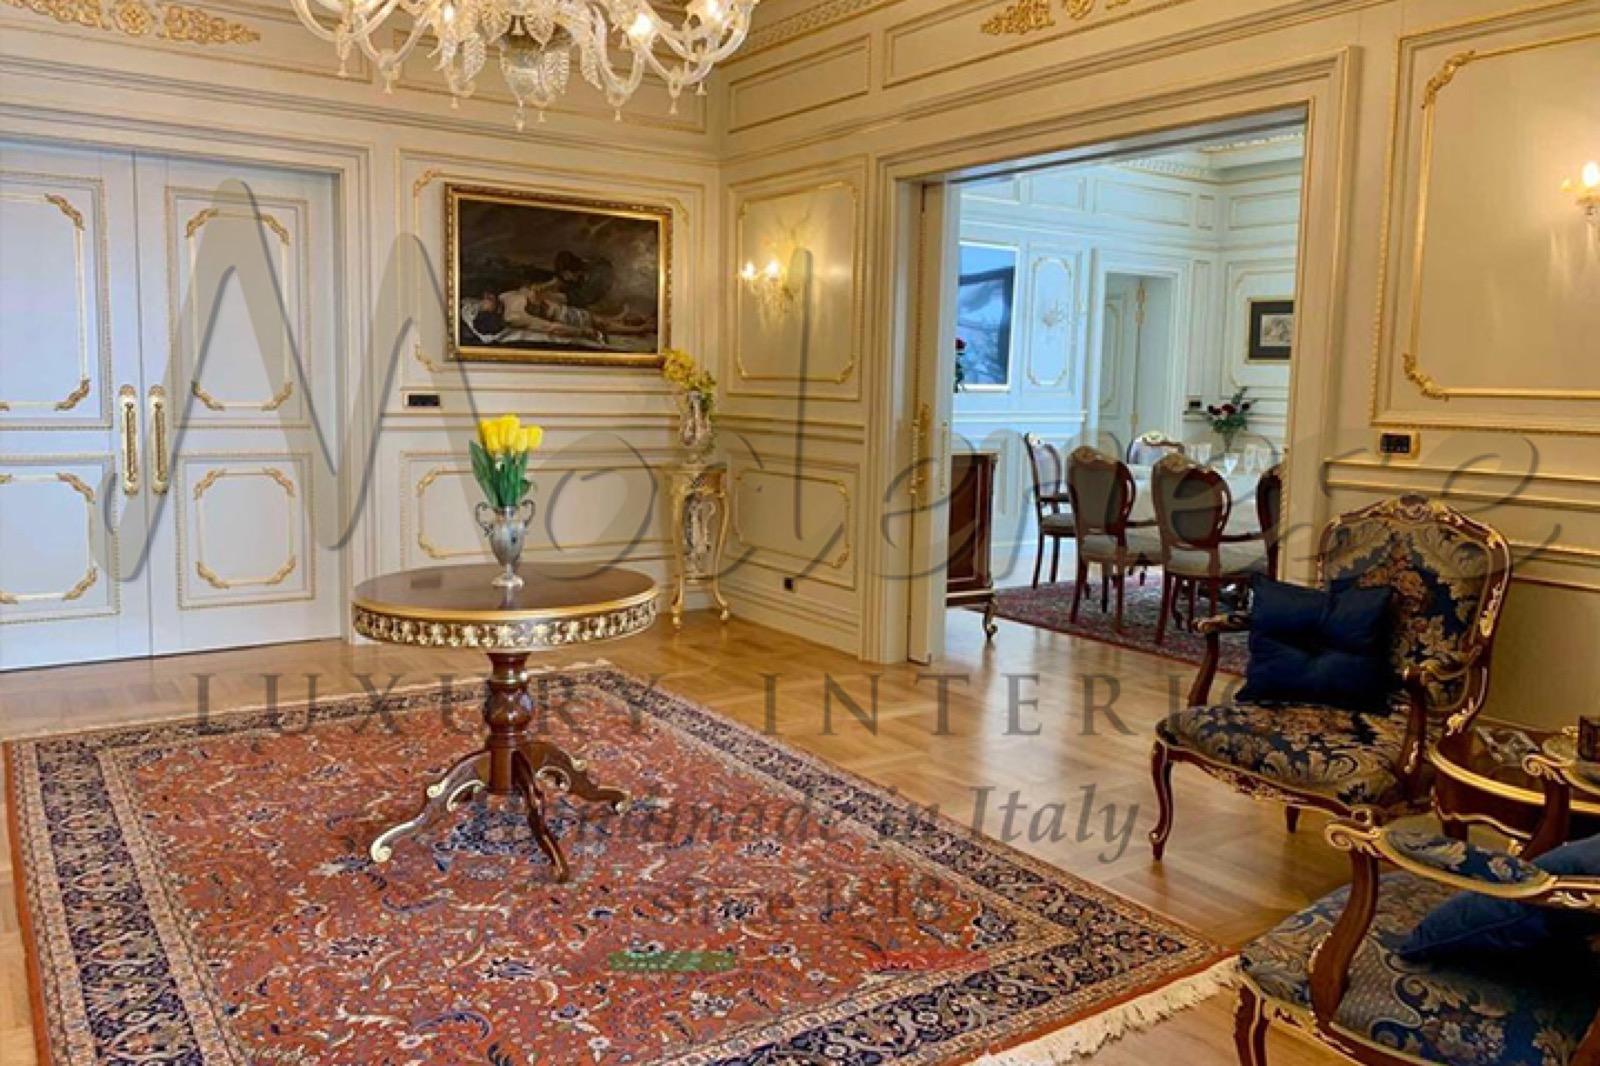 Abuja Nigeria showroom opening African luxury furniture luxurious living interior design Cadastral Gaduwa Gadu District made in Italy home décor